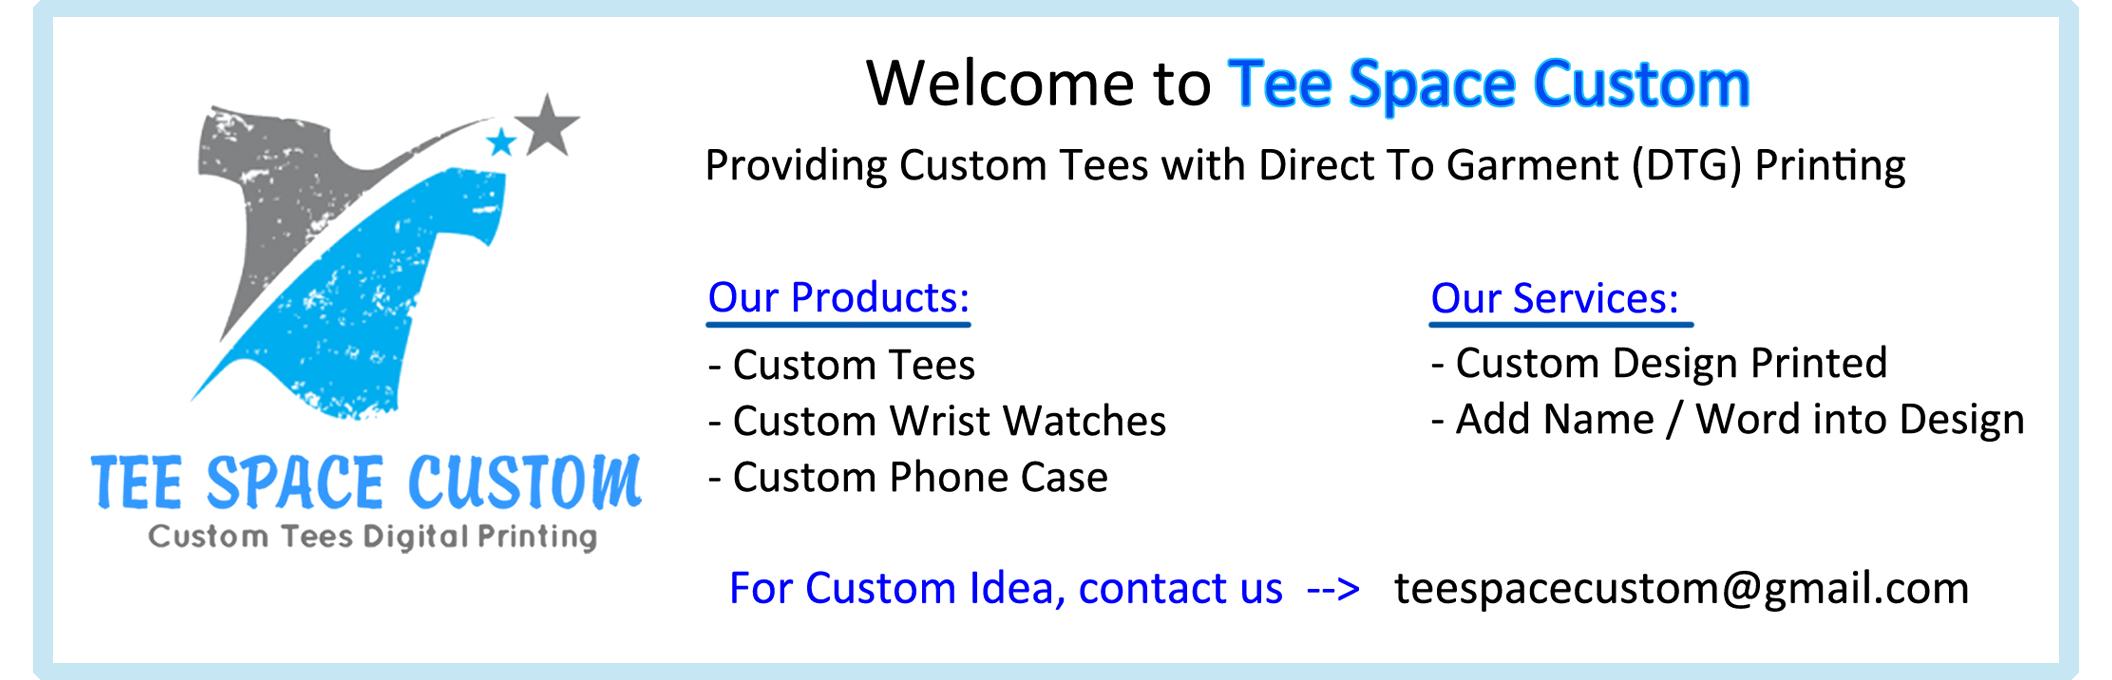 Tee Space Custom